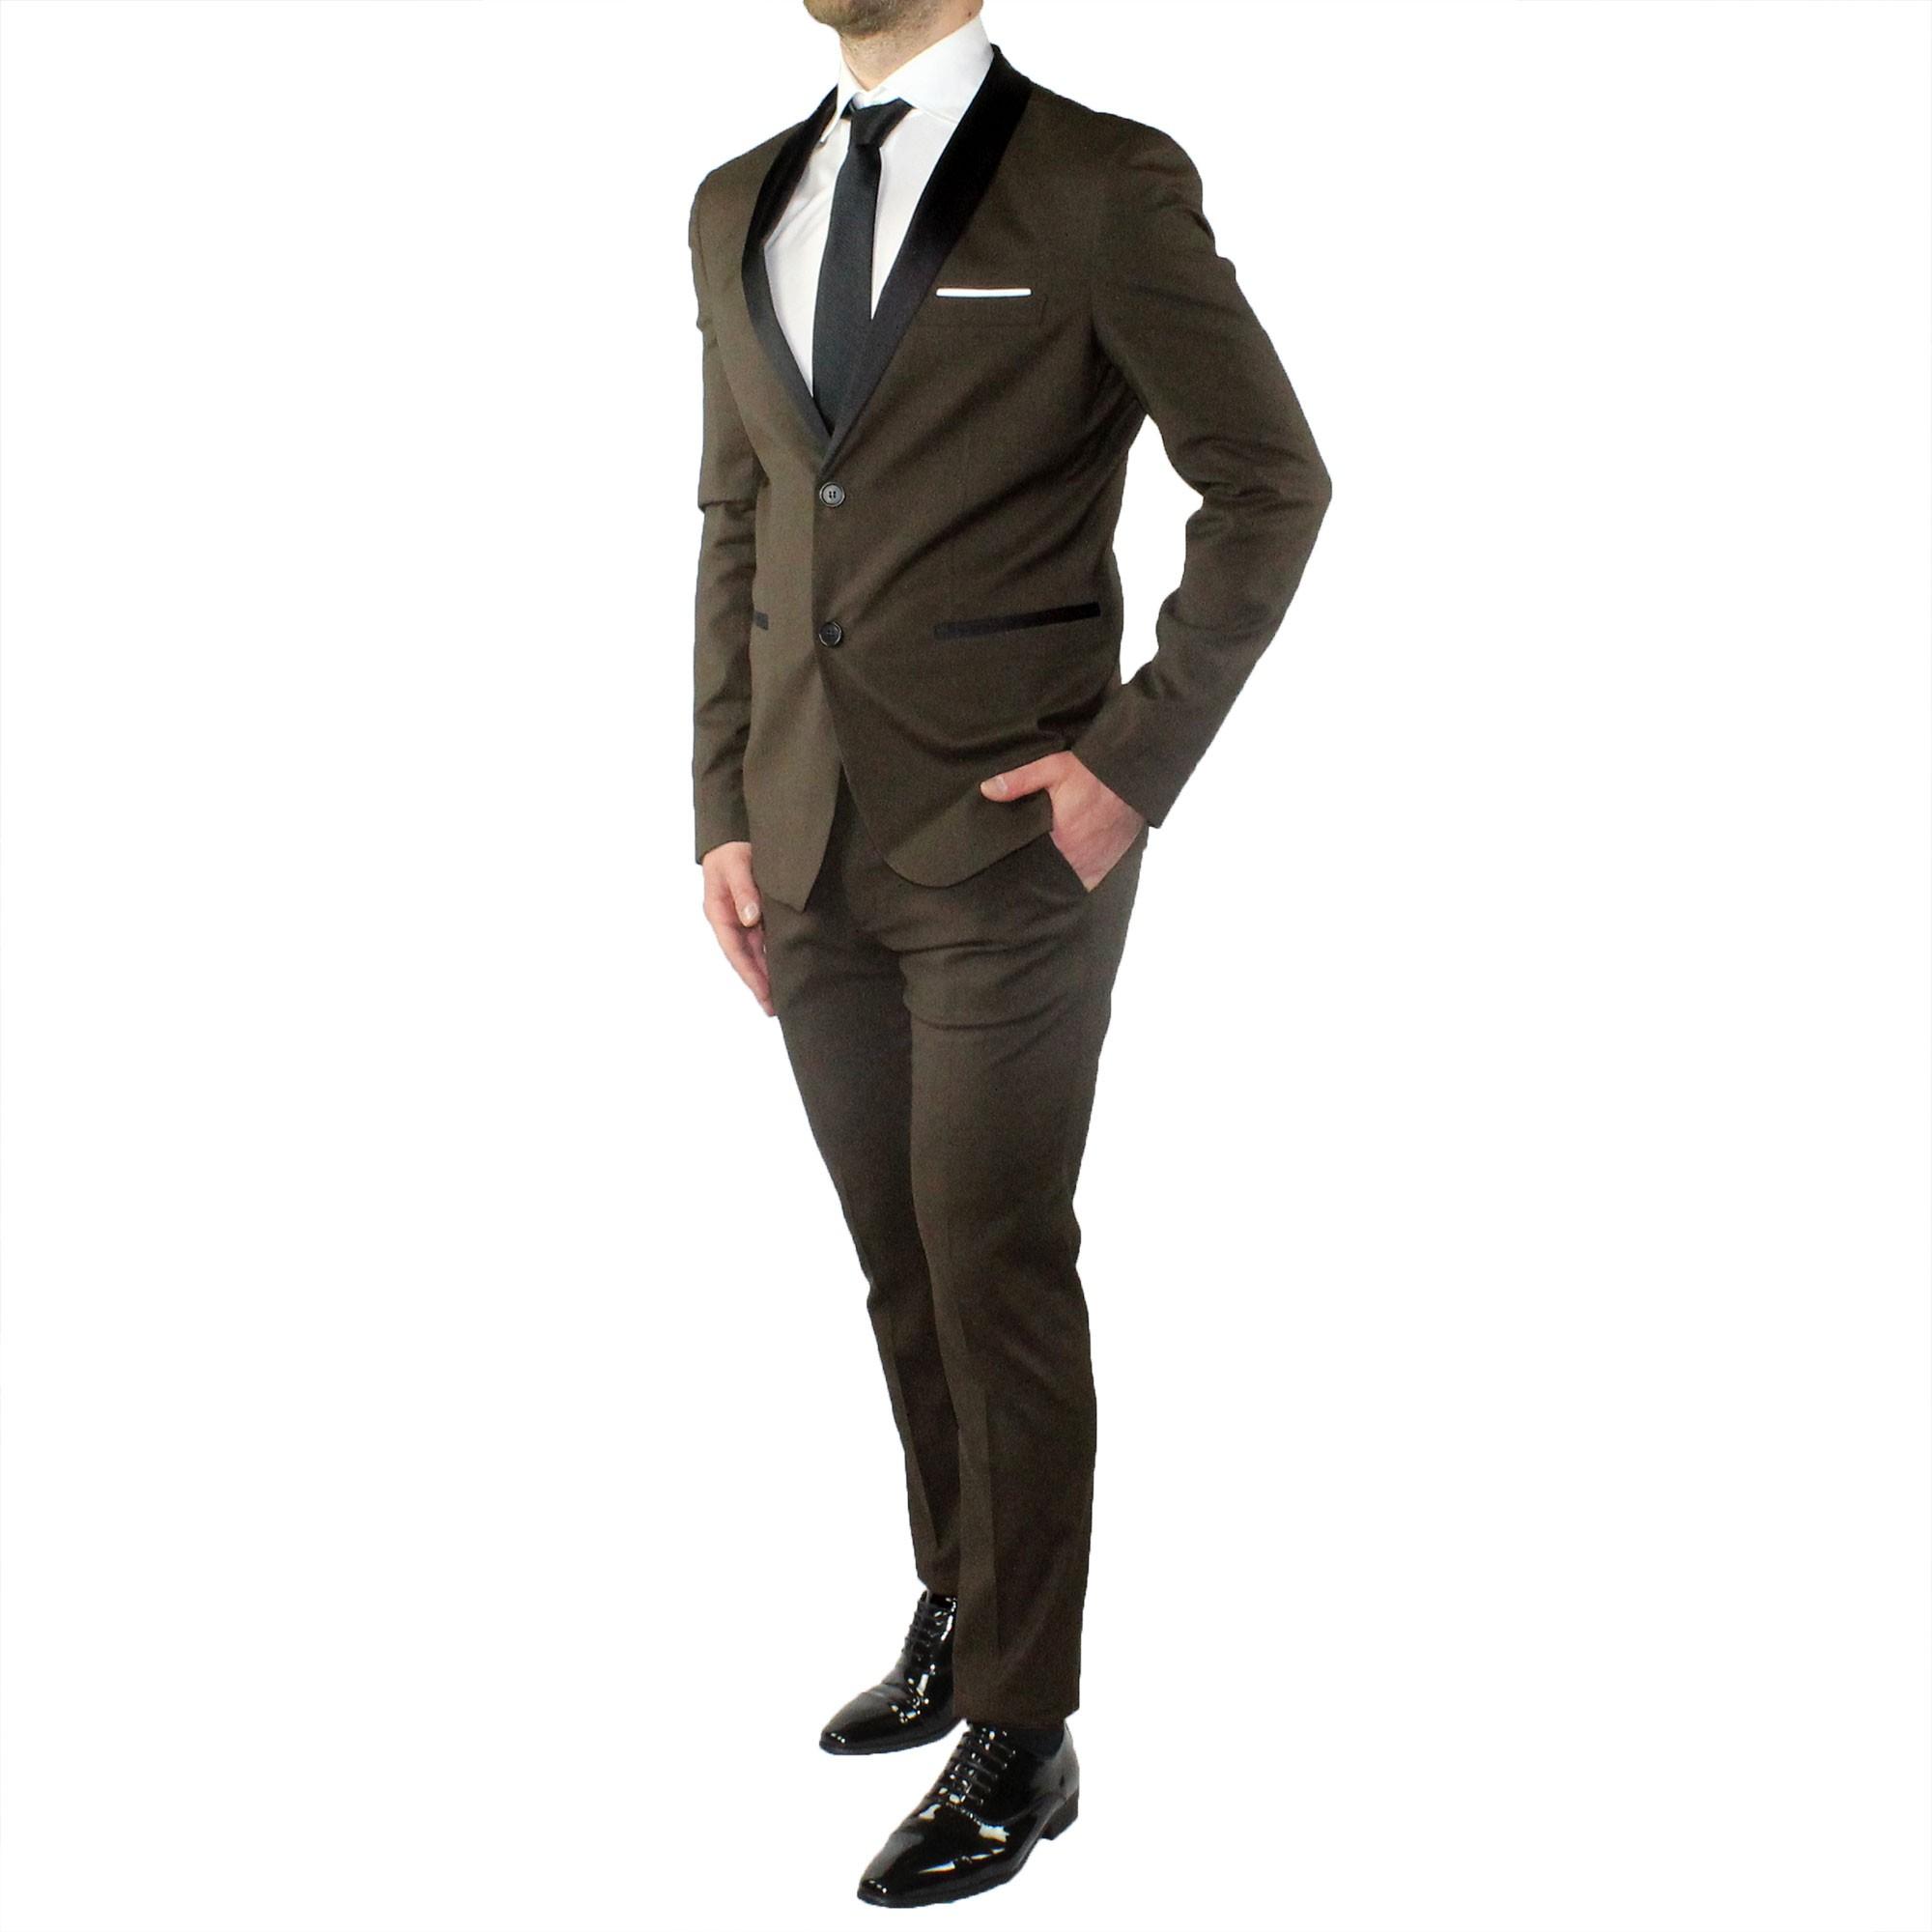 Abito-Uomo-Smoking-Elegante-Vestito-Completo-Estivo-Cerimonia-Sartoriale-Slim miniatura 18